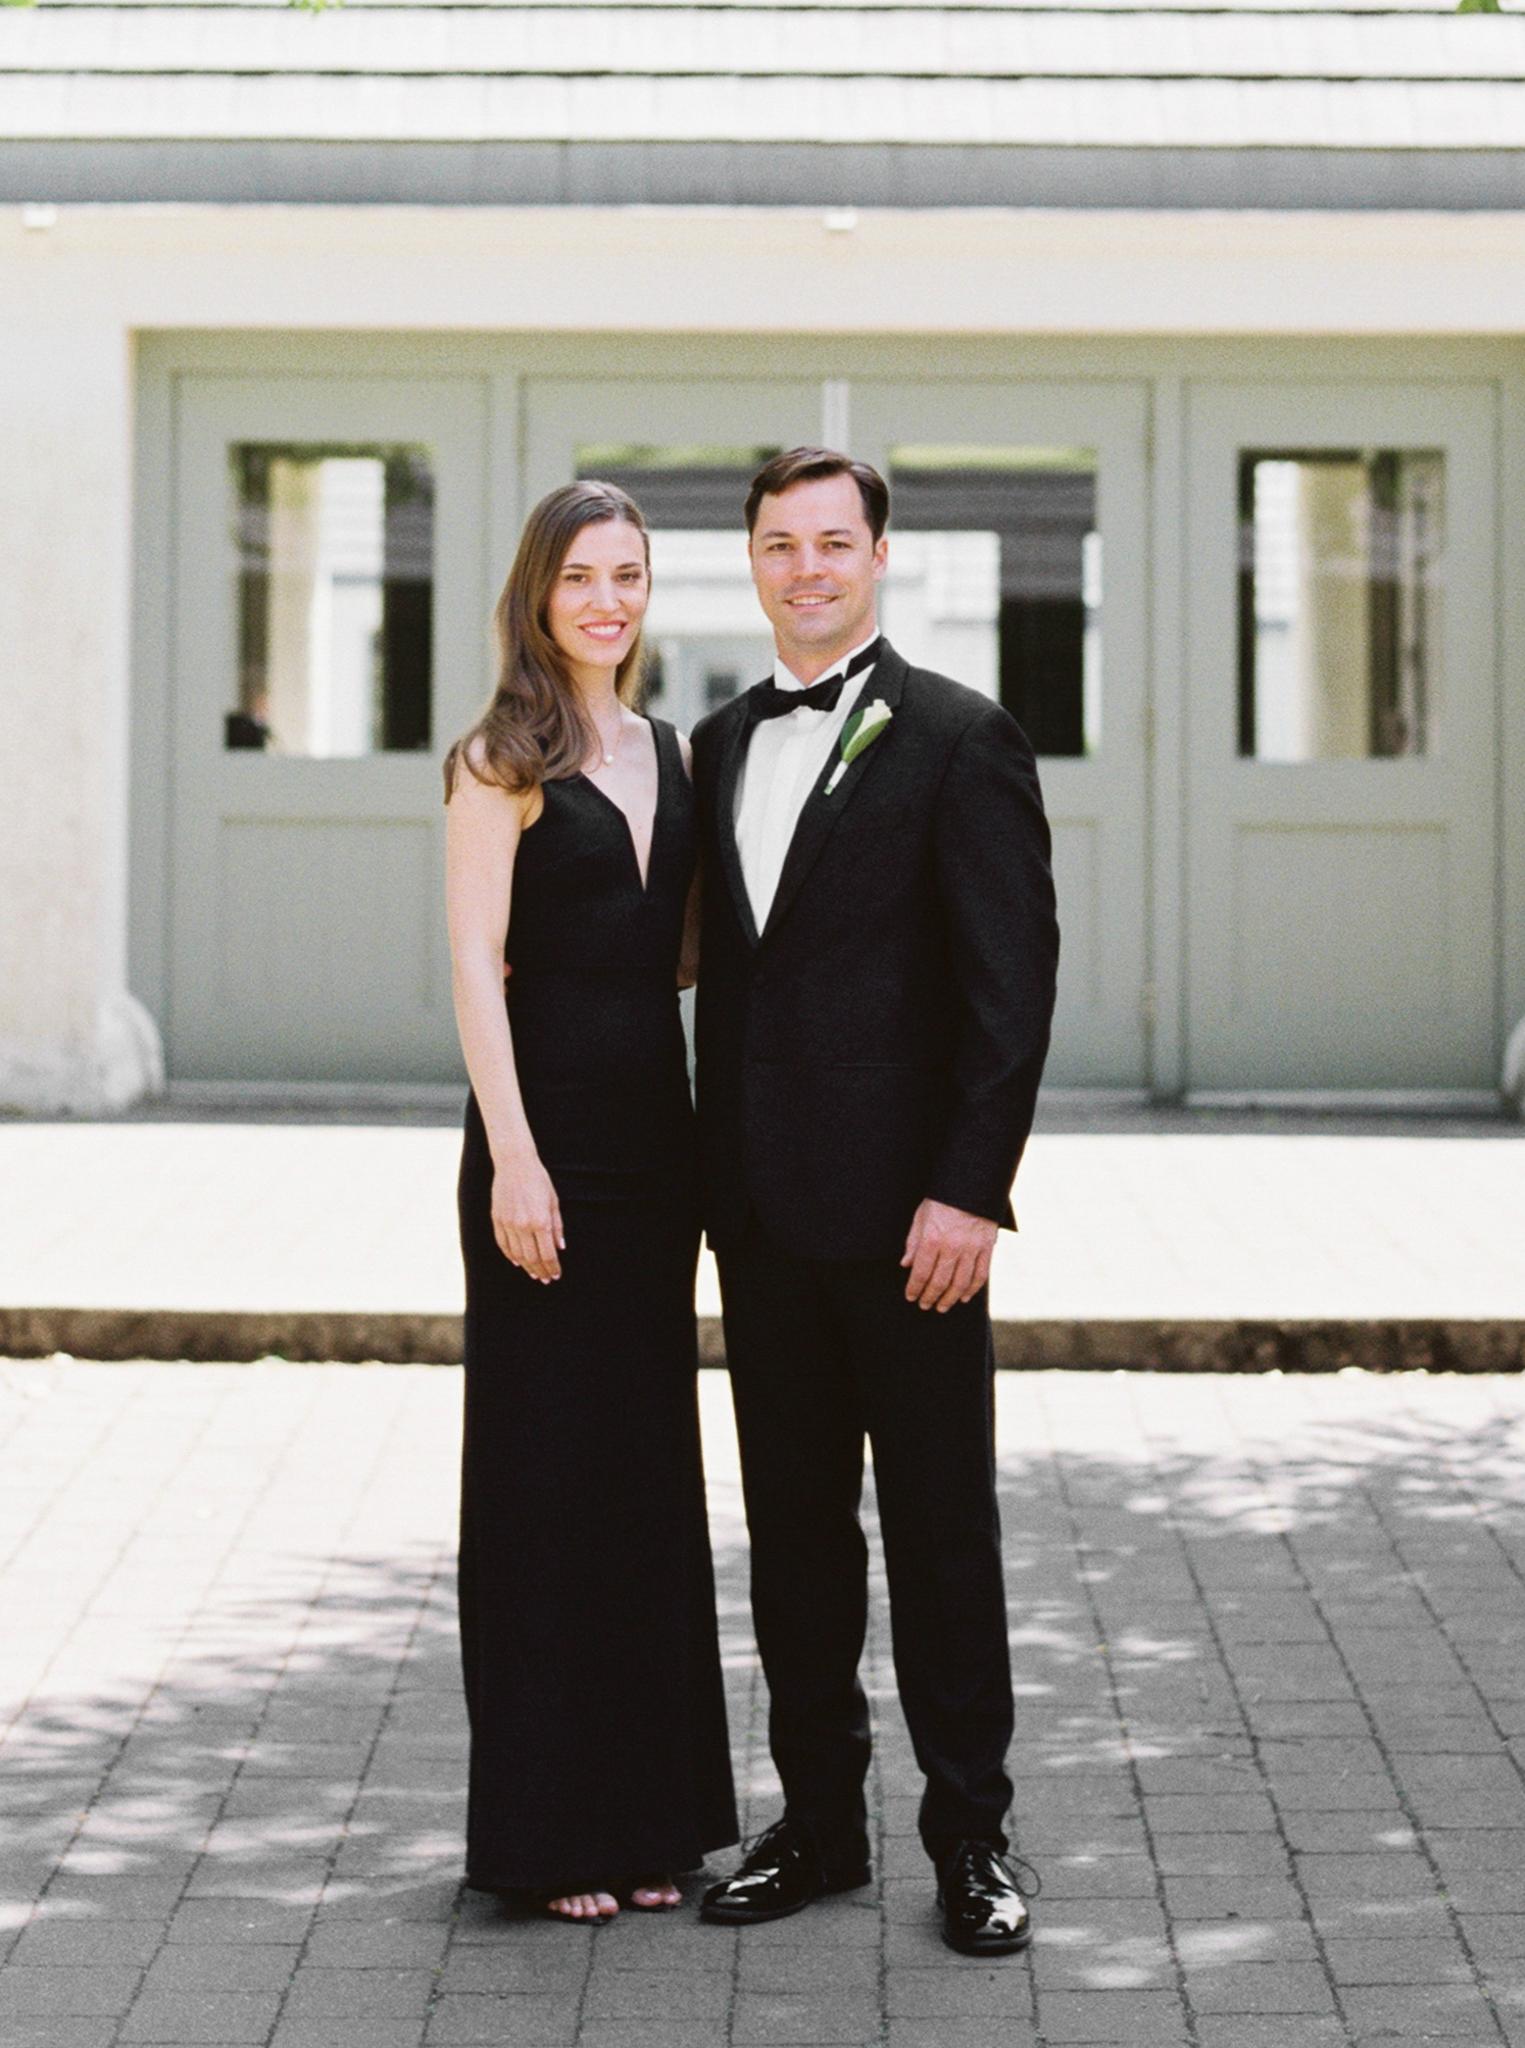 074OutliveCreative_Travel_Photographer_Videographer_Lewis&Clark_Oregon_Elegant_BlackTie_Destination_Wedding.jpg